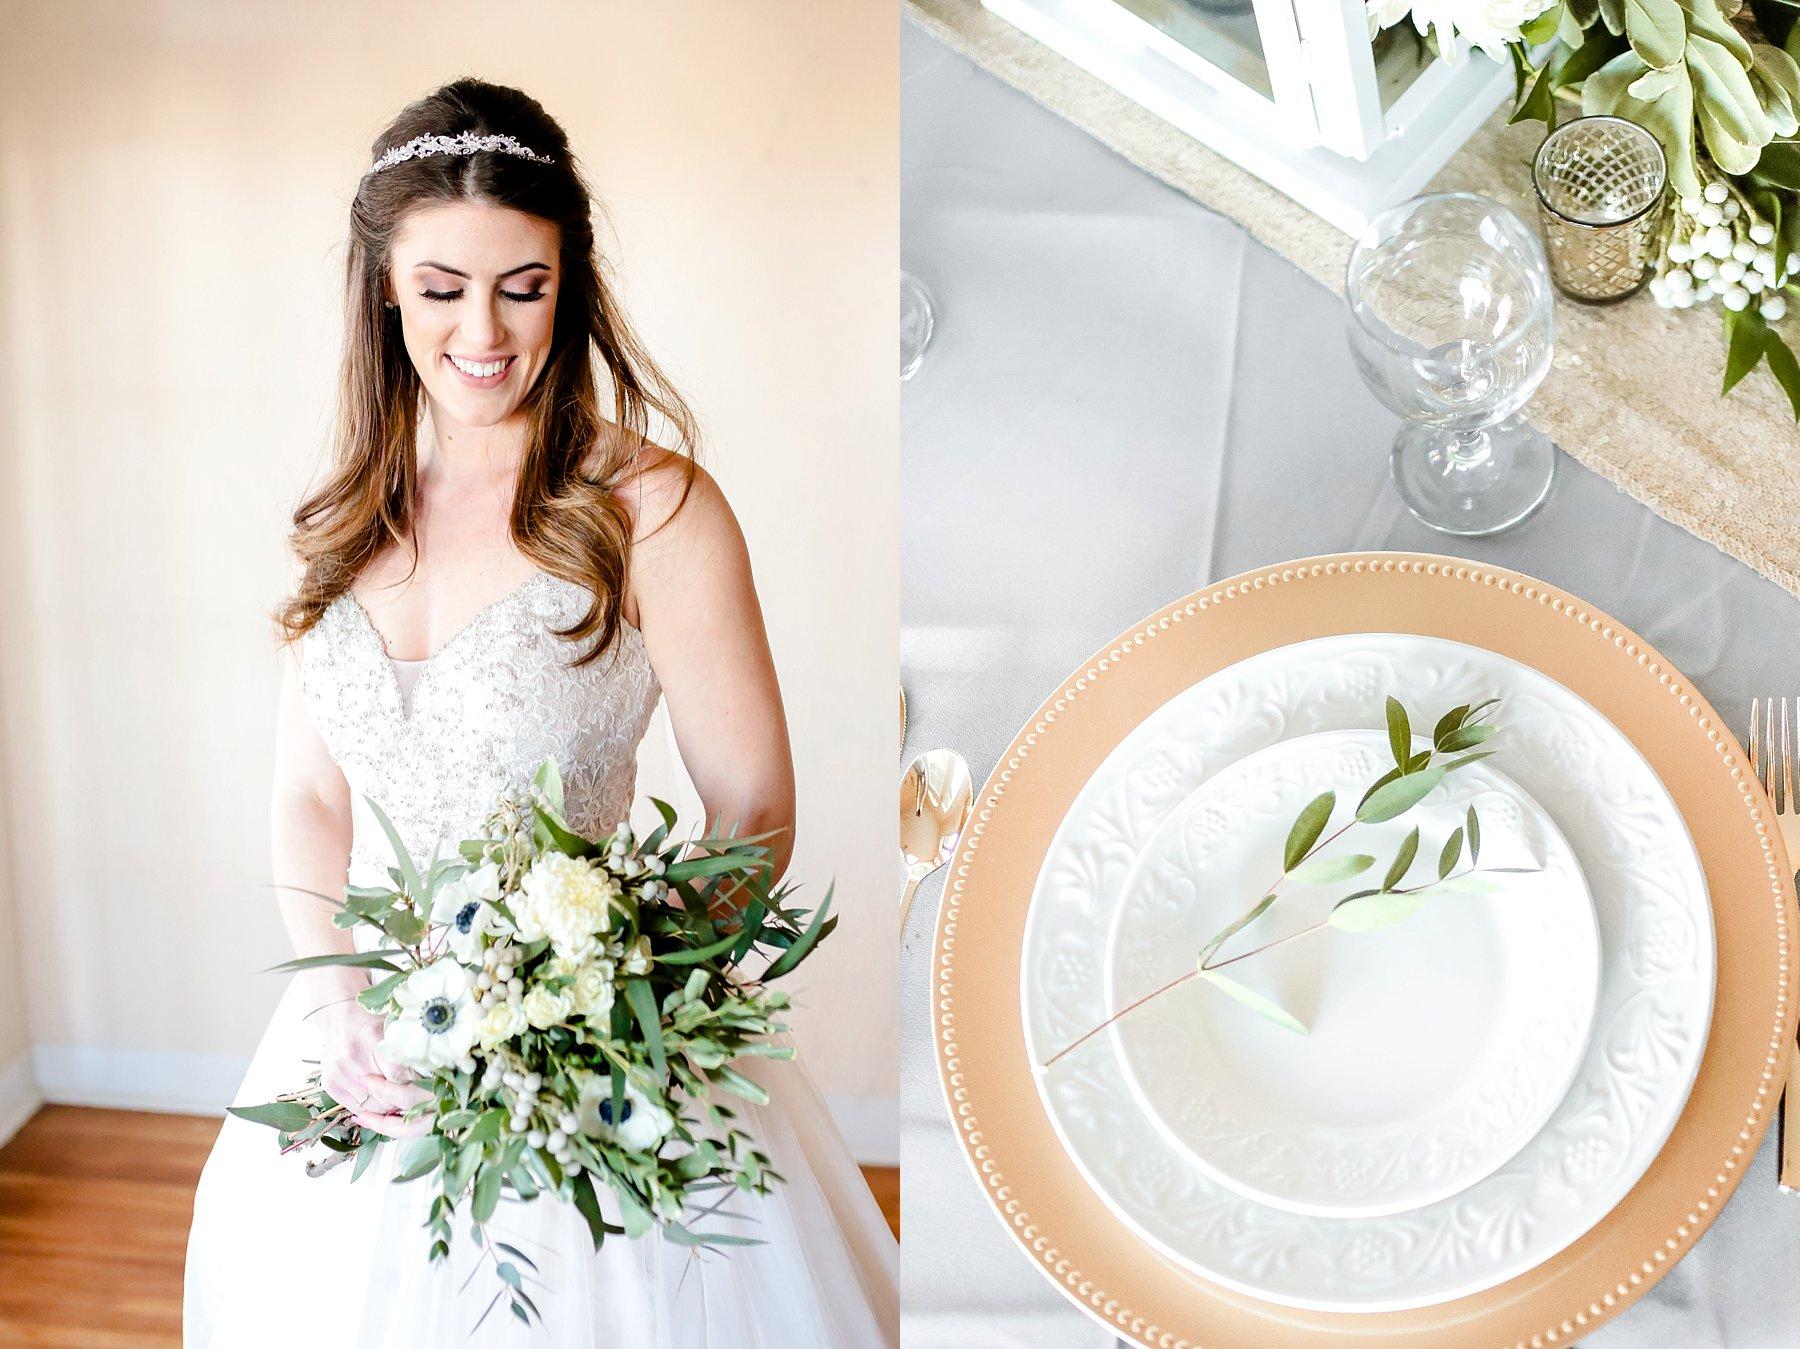 photographer_wedding_saint_louis_Kansas_City_Photography_Videography_workshop_training_styled_engagement_Lake_Ozark_KC_MO_STL_Rolla_Hermann_Saint_James_0415.jpg